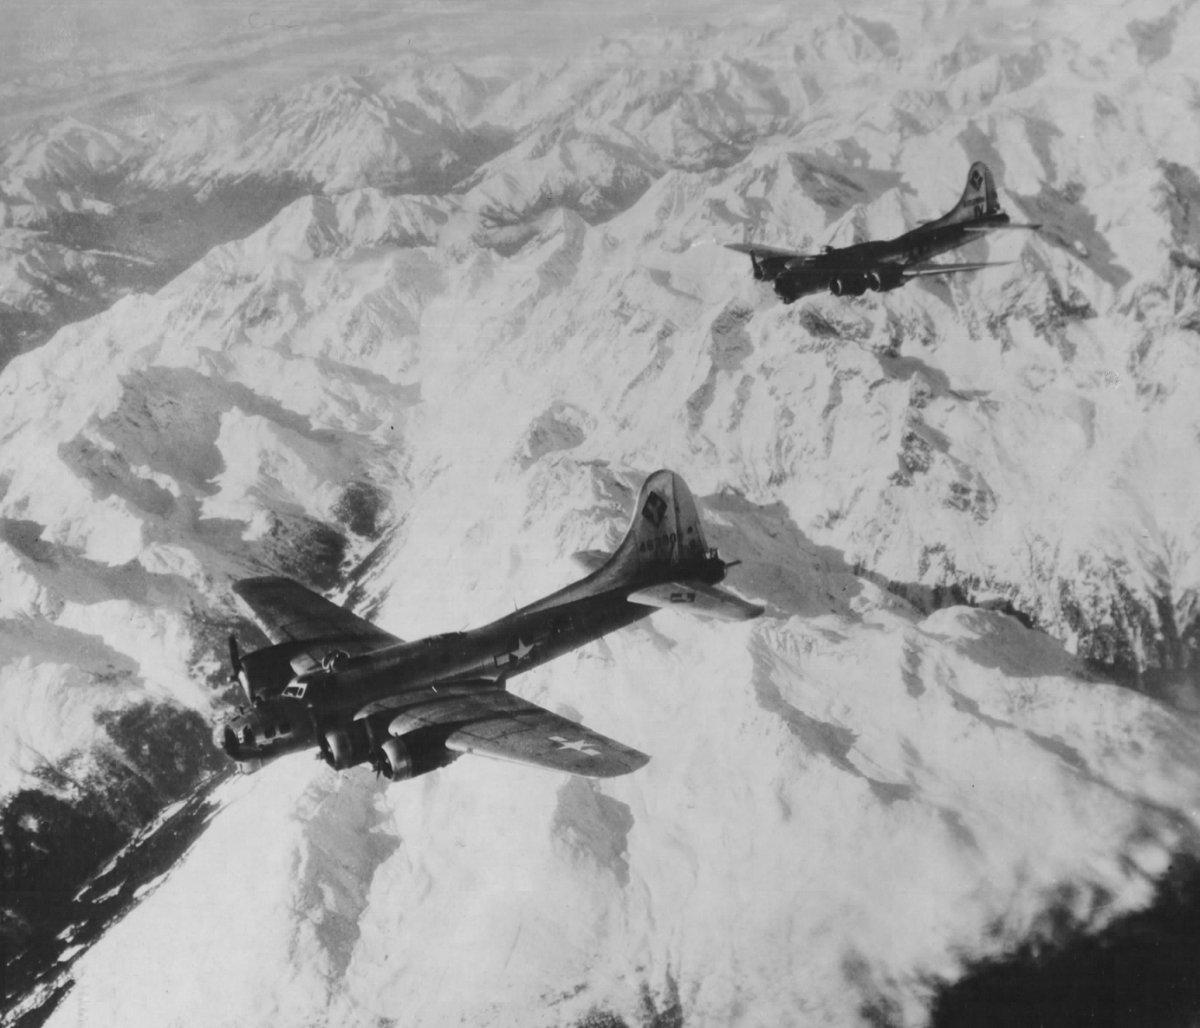 B-17 #44-6380